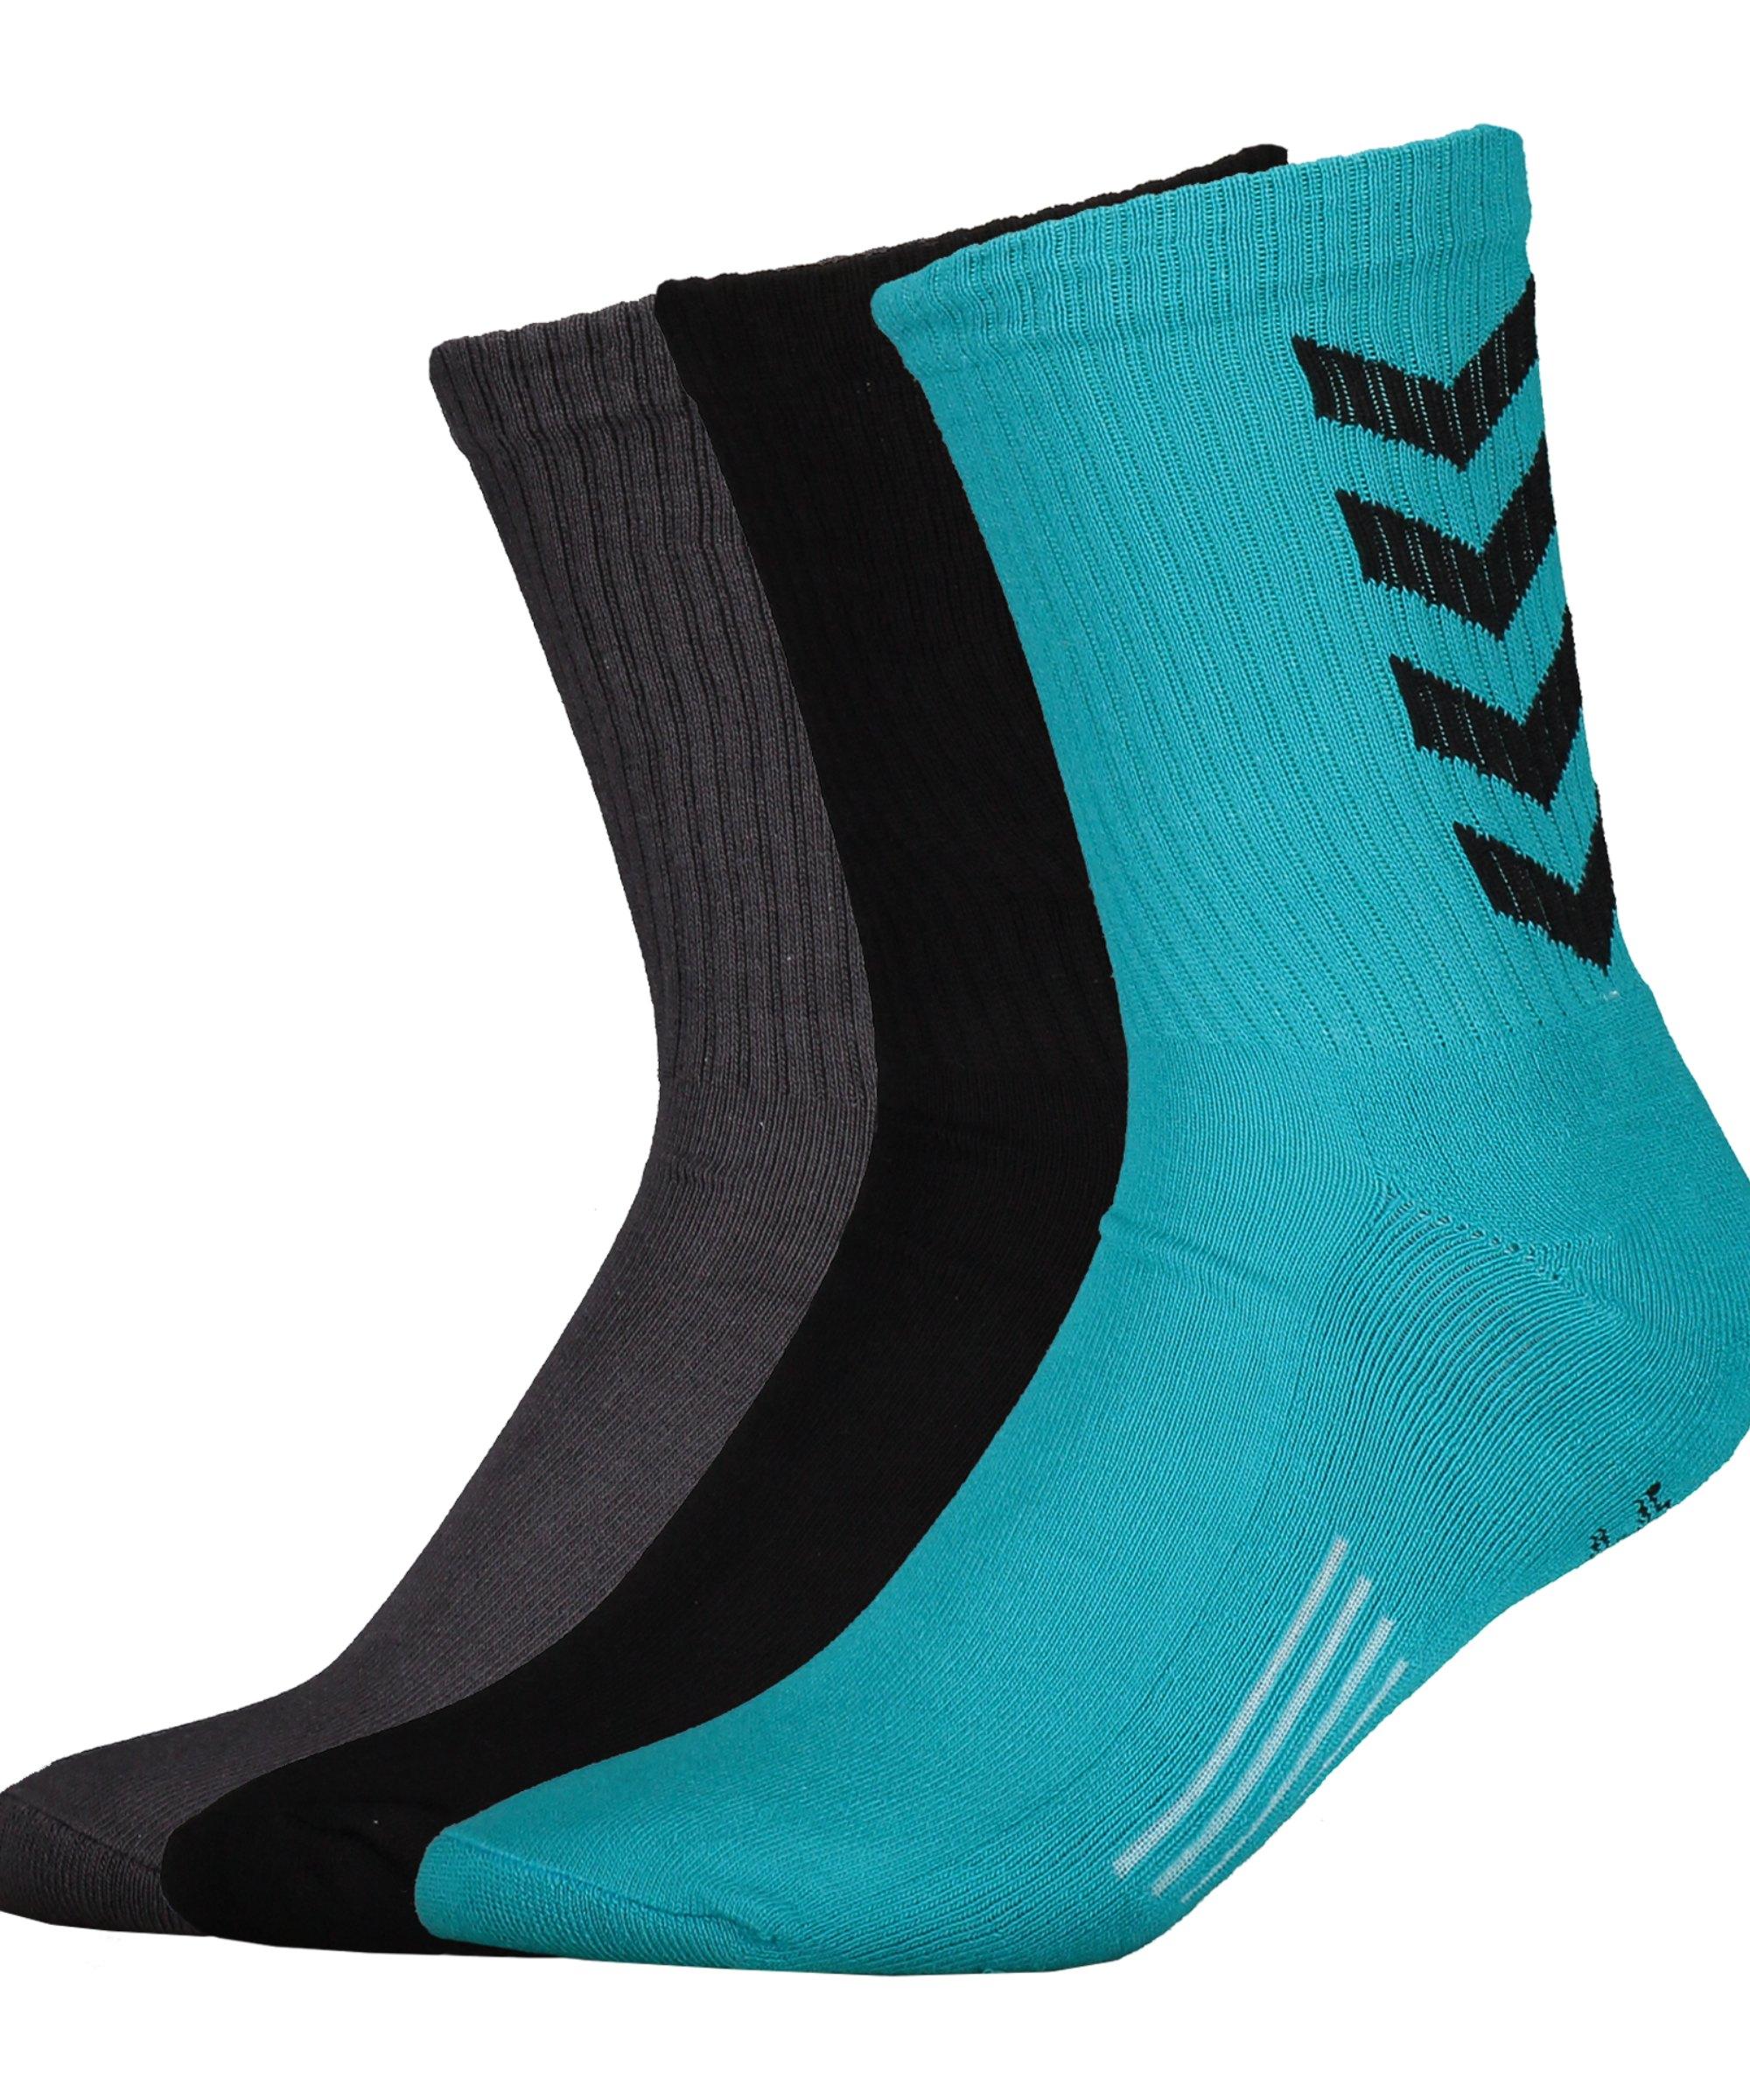 Hummel Fundamental 3-Pack Socken F3099 - blau